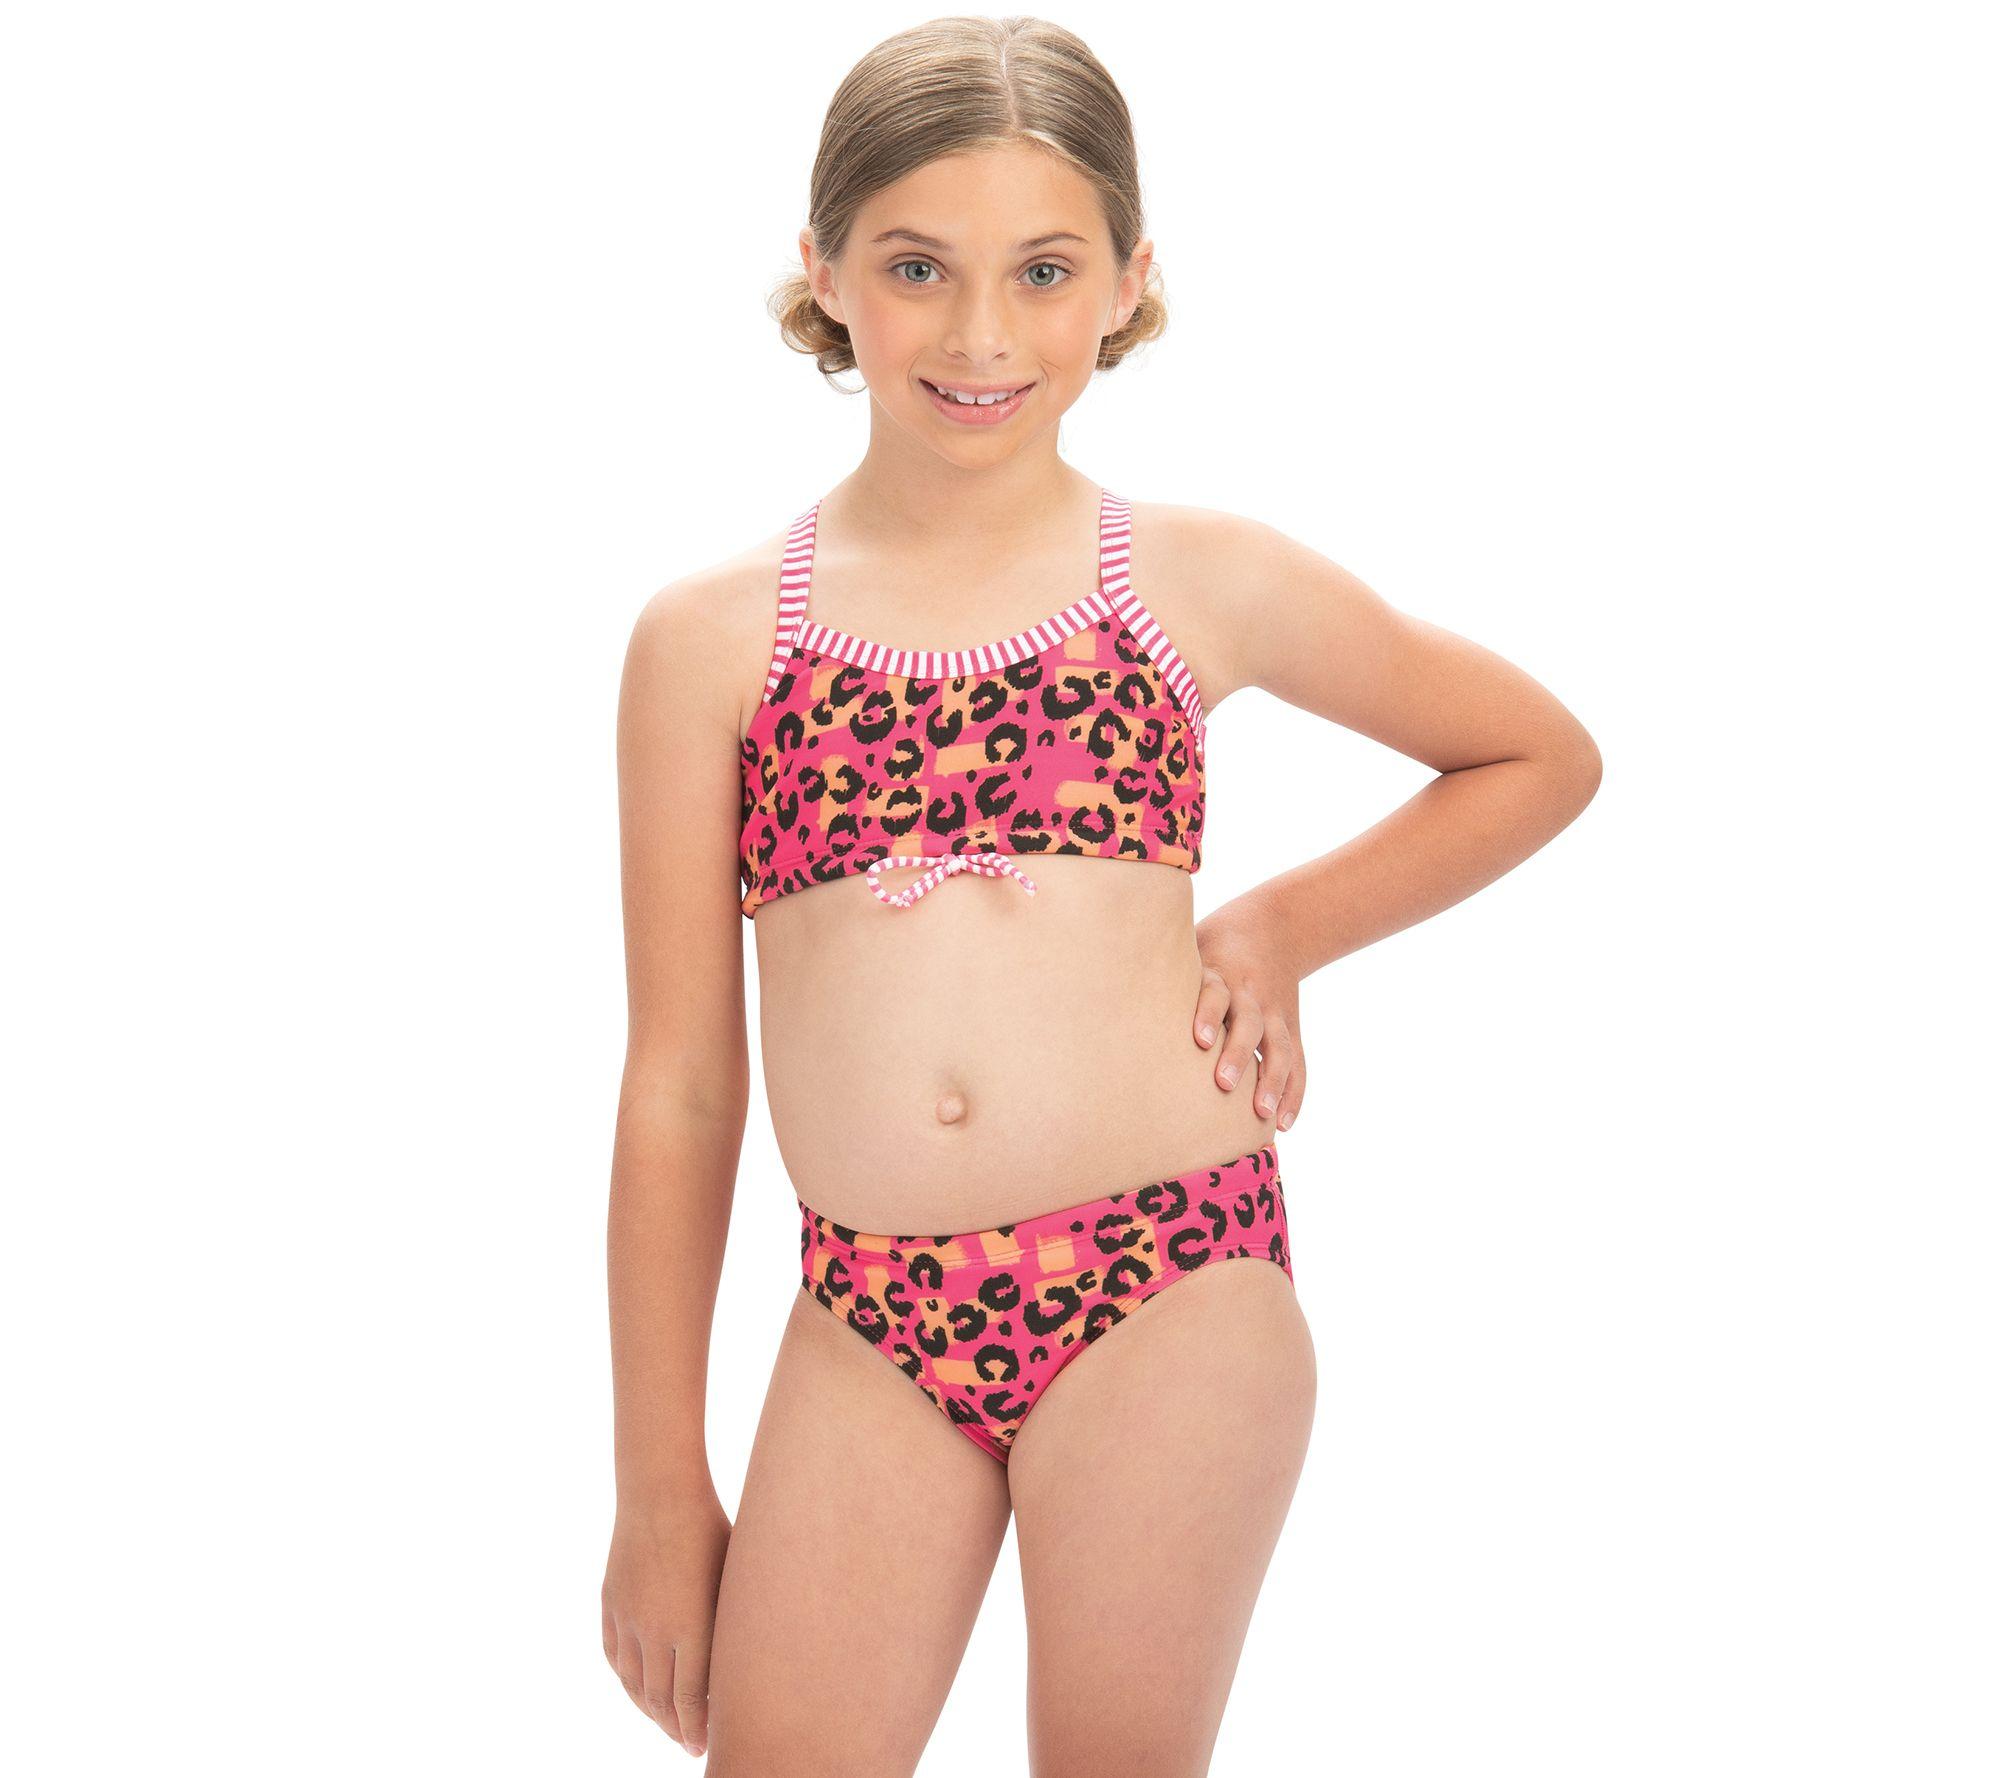 a701fb3fe09 Dolfin Uglies Girls Rawr Print 2-Piece Swimsuit — QVC.com